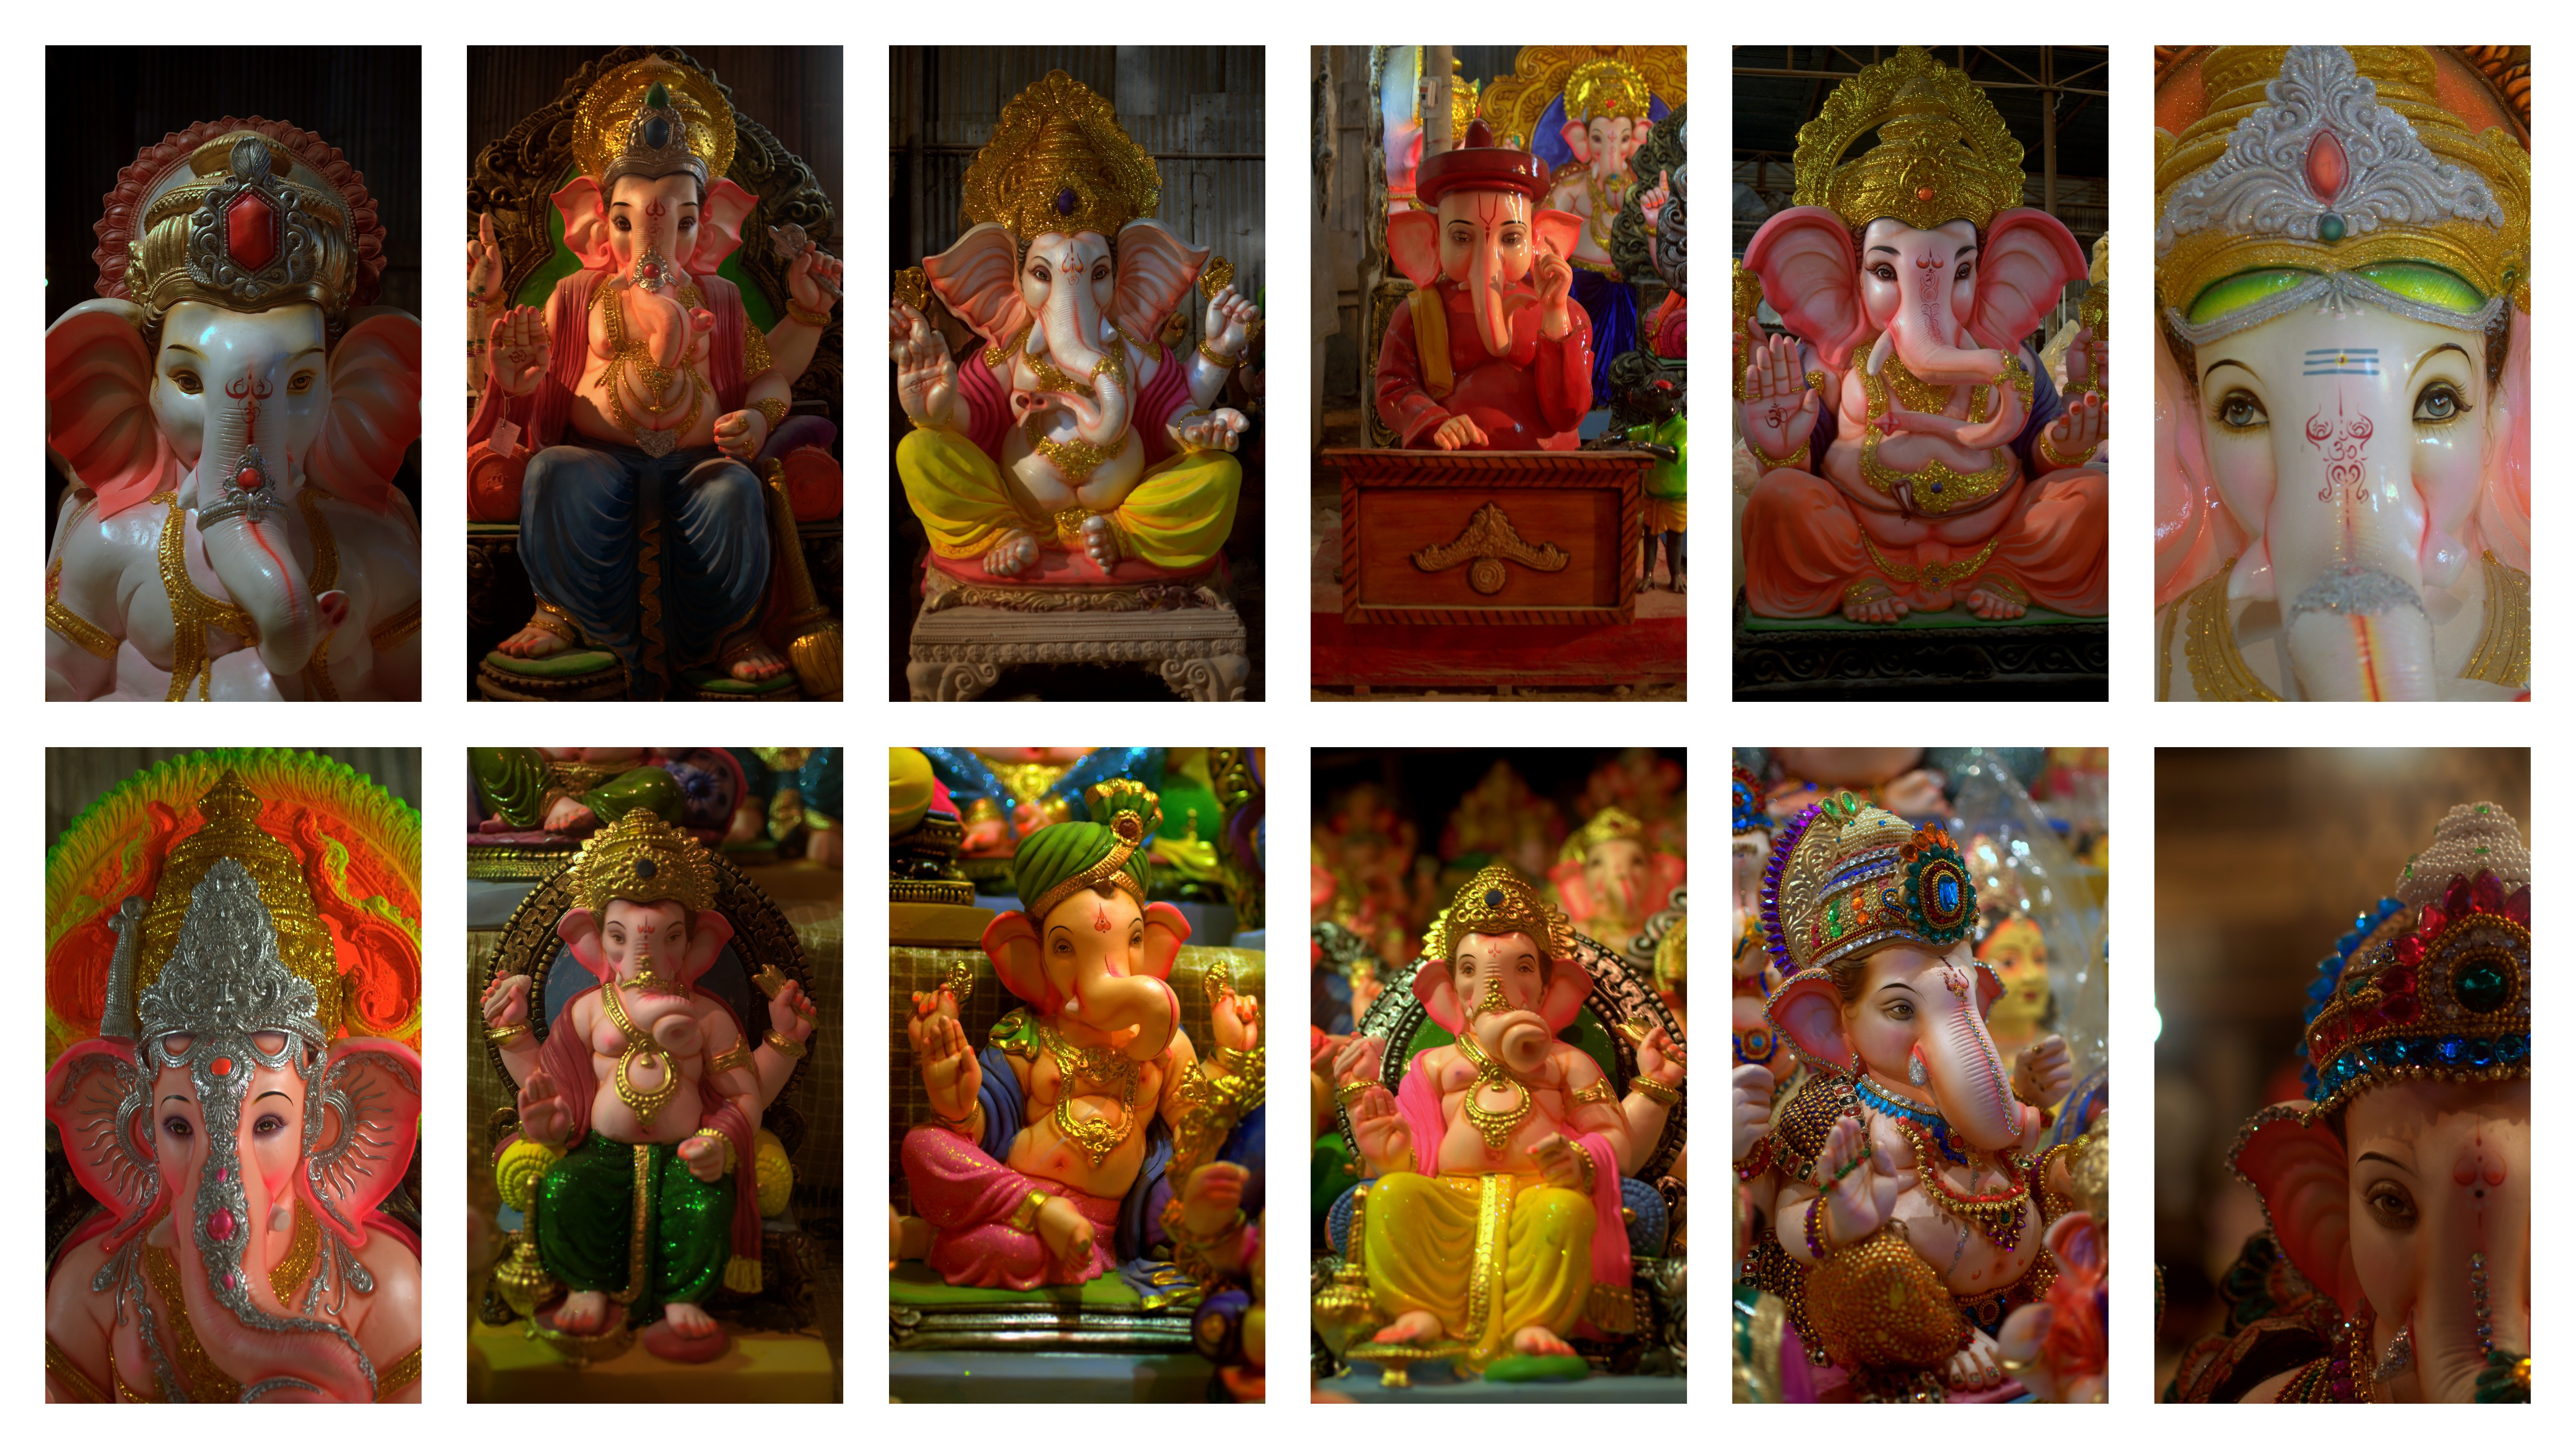 2013-09-10 Ganesh Idols